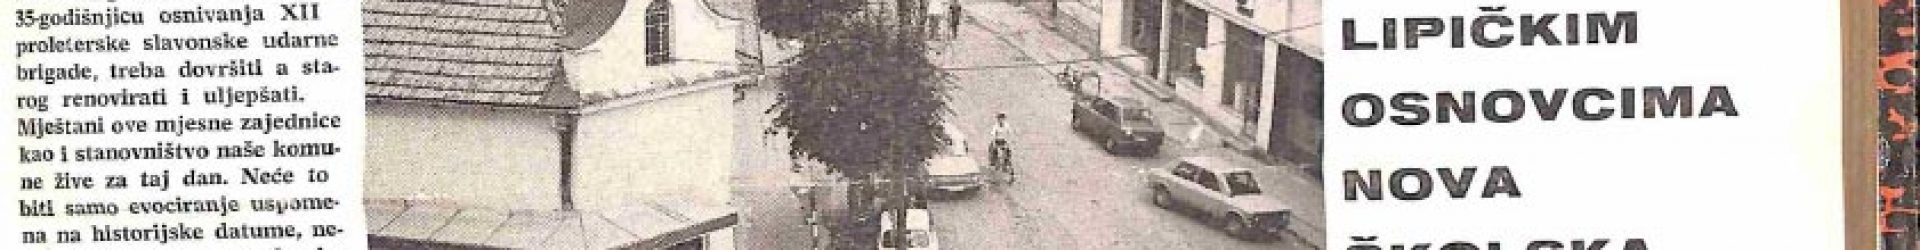 31 kolovoza 1977